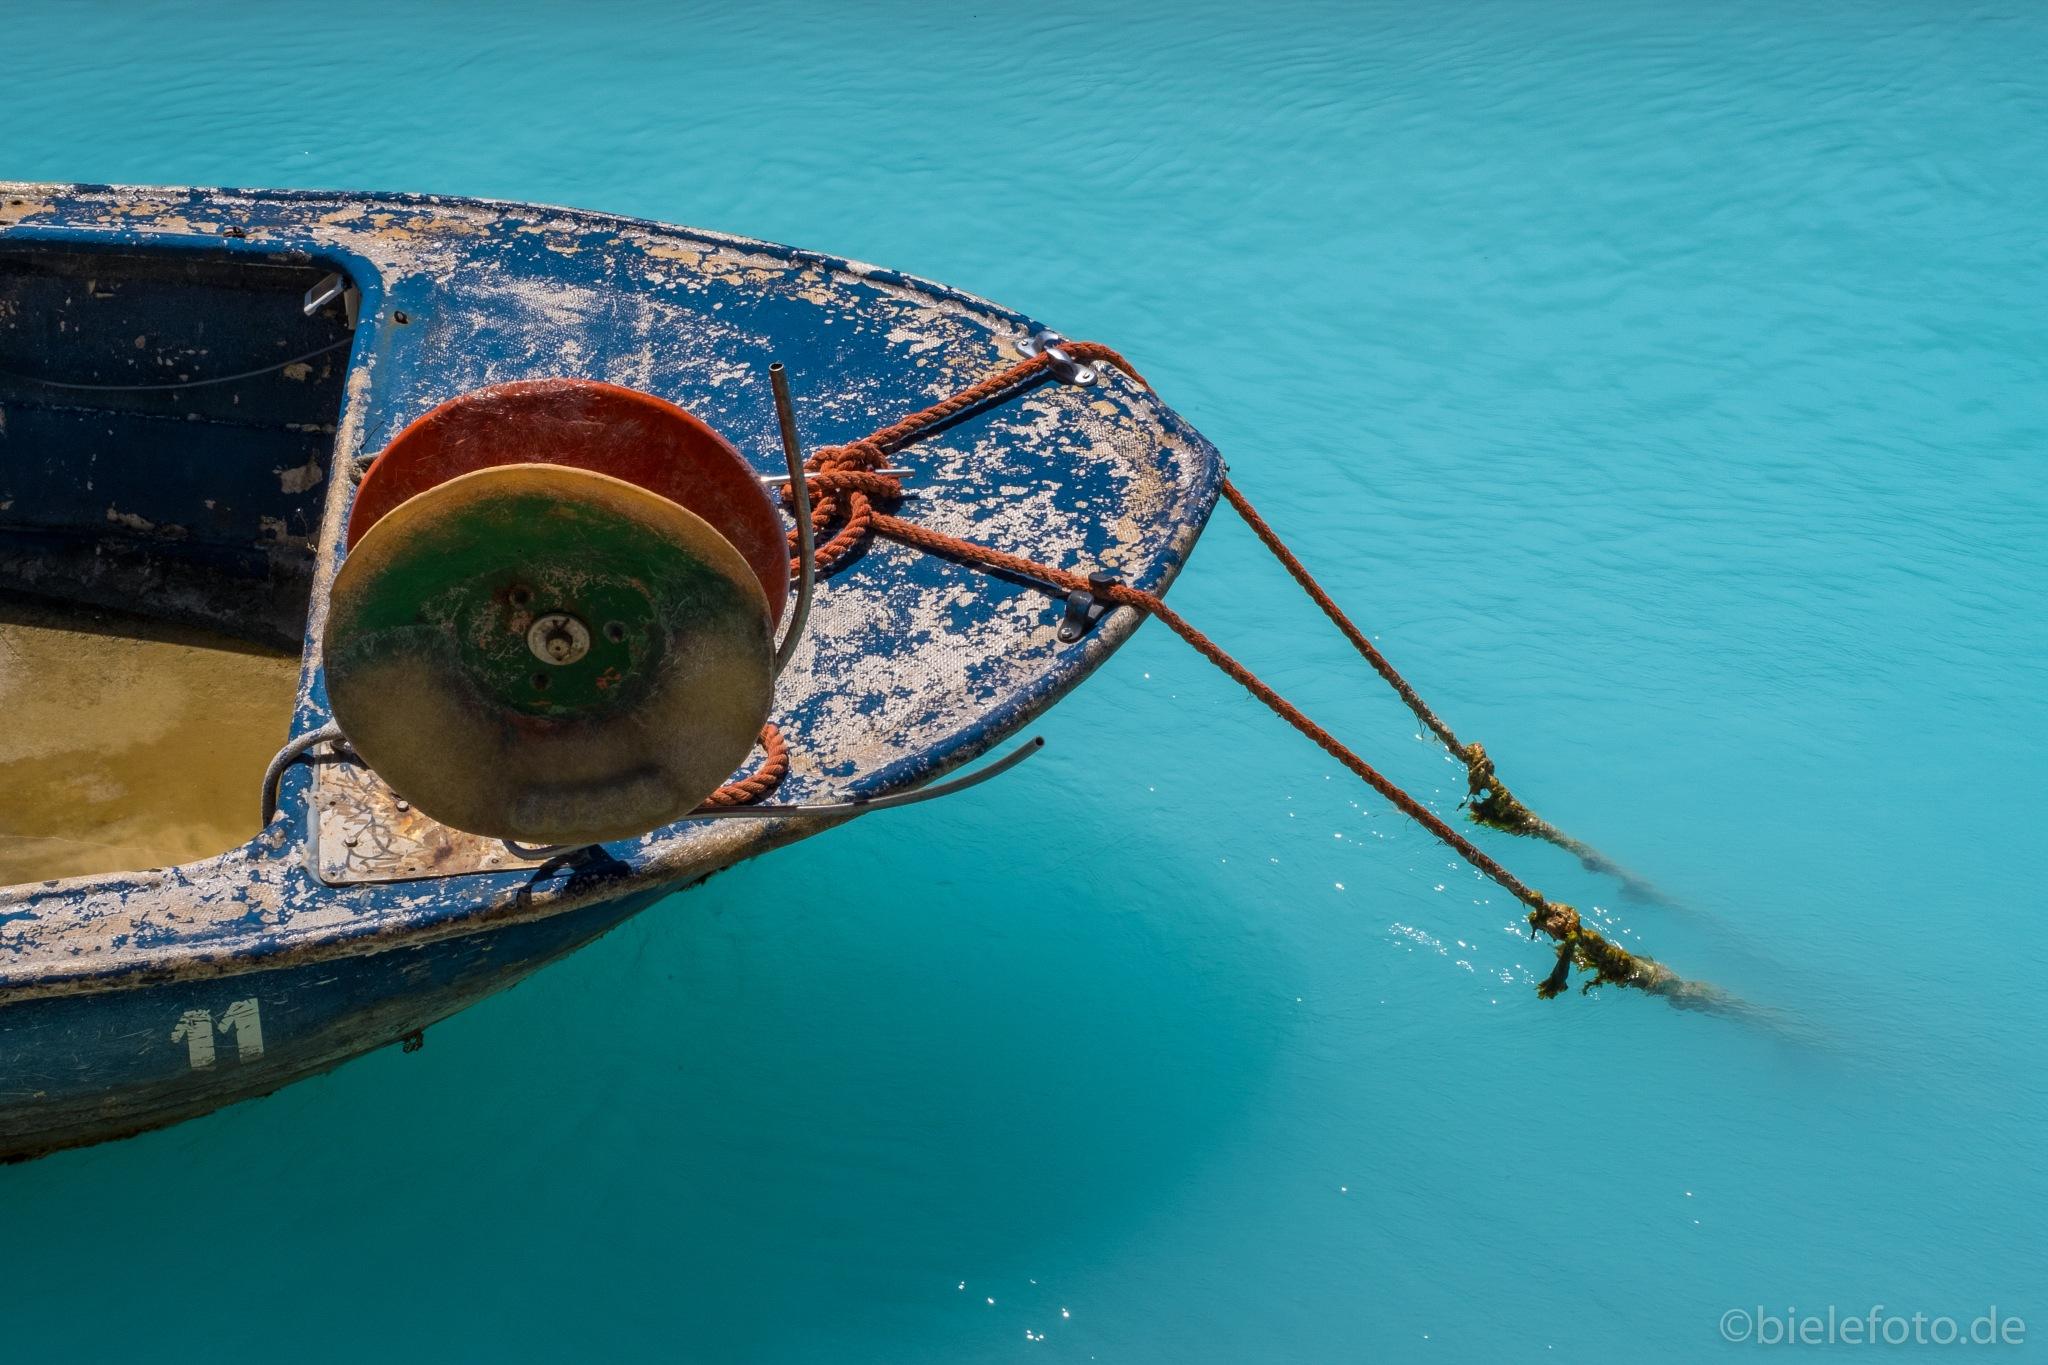 Fishing boat in Tuscany by bielefoto (Oliver Isermann)